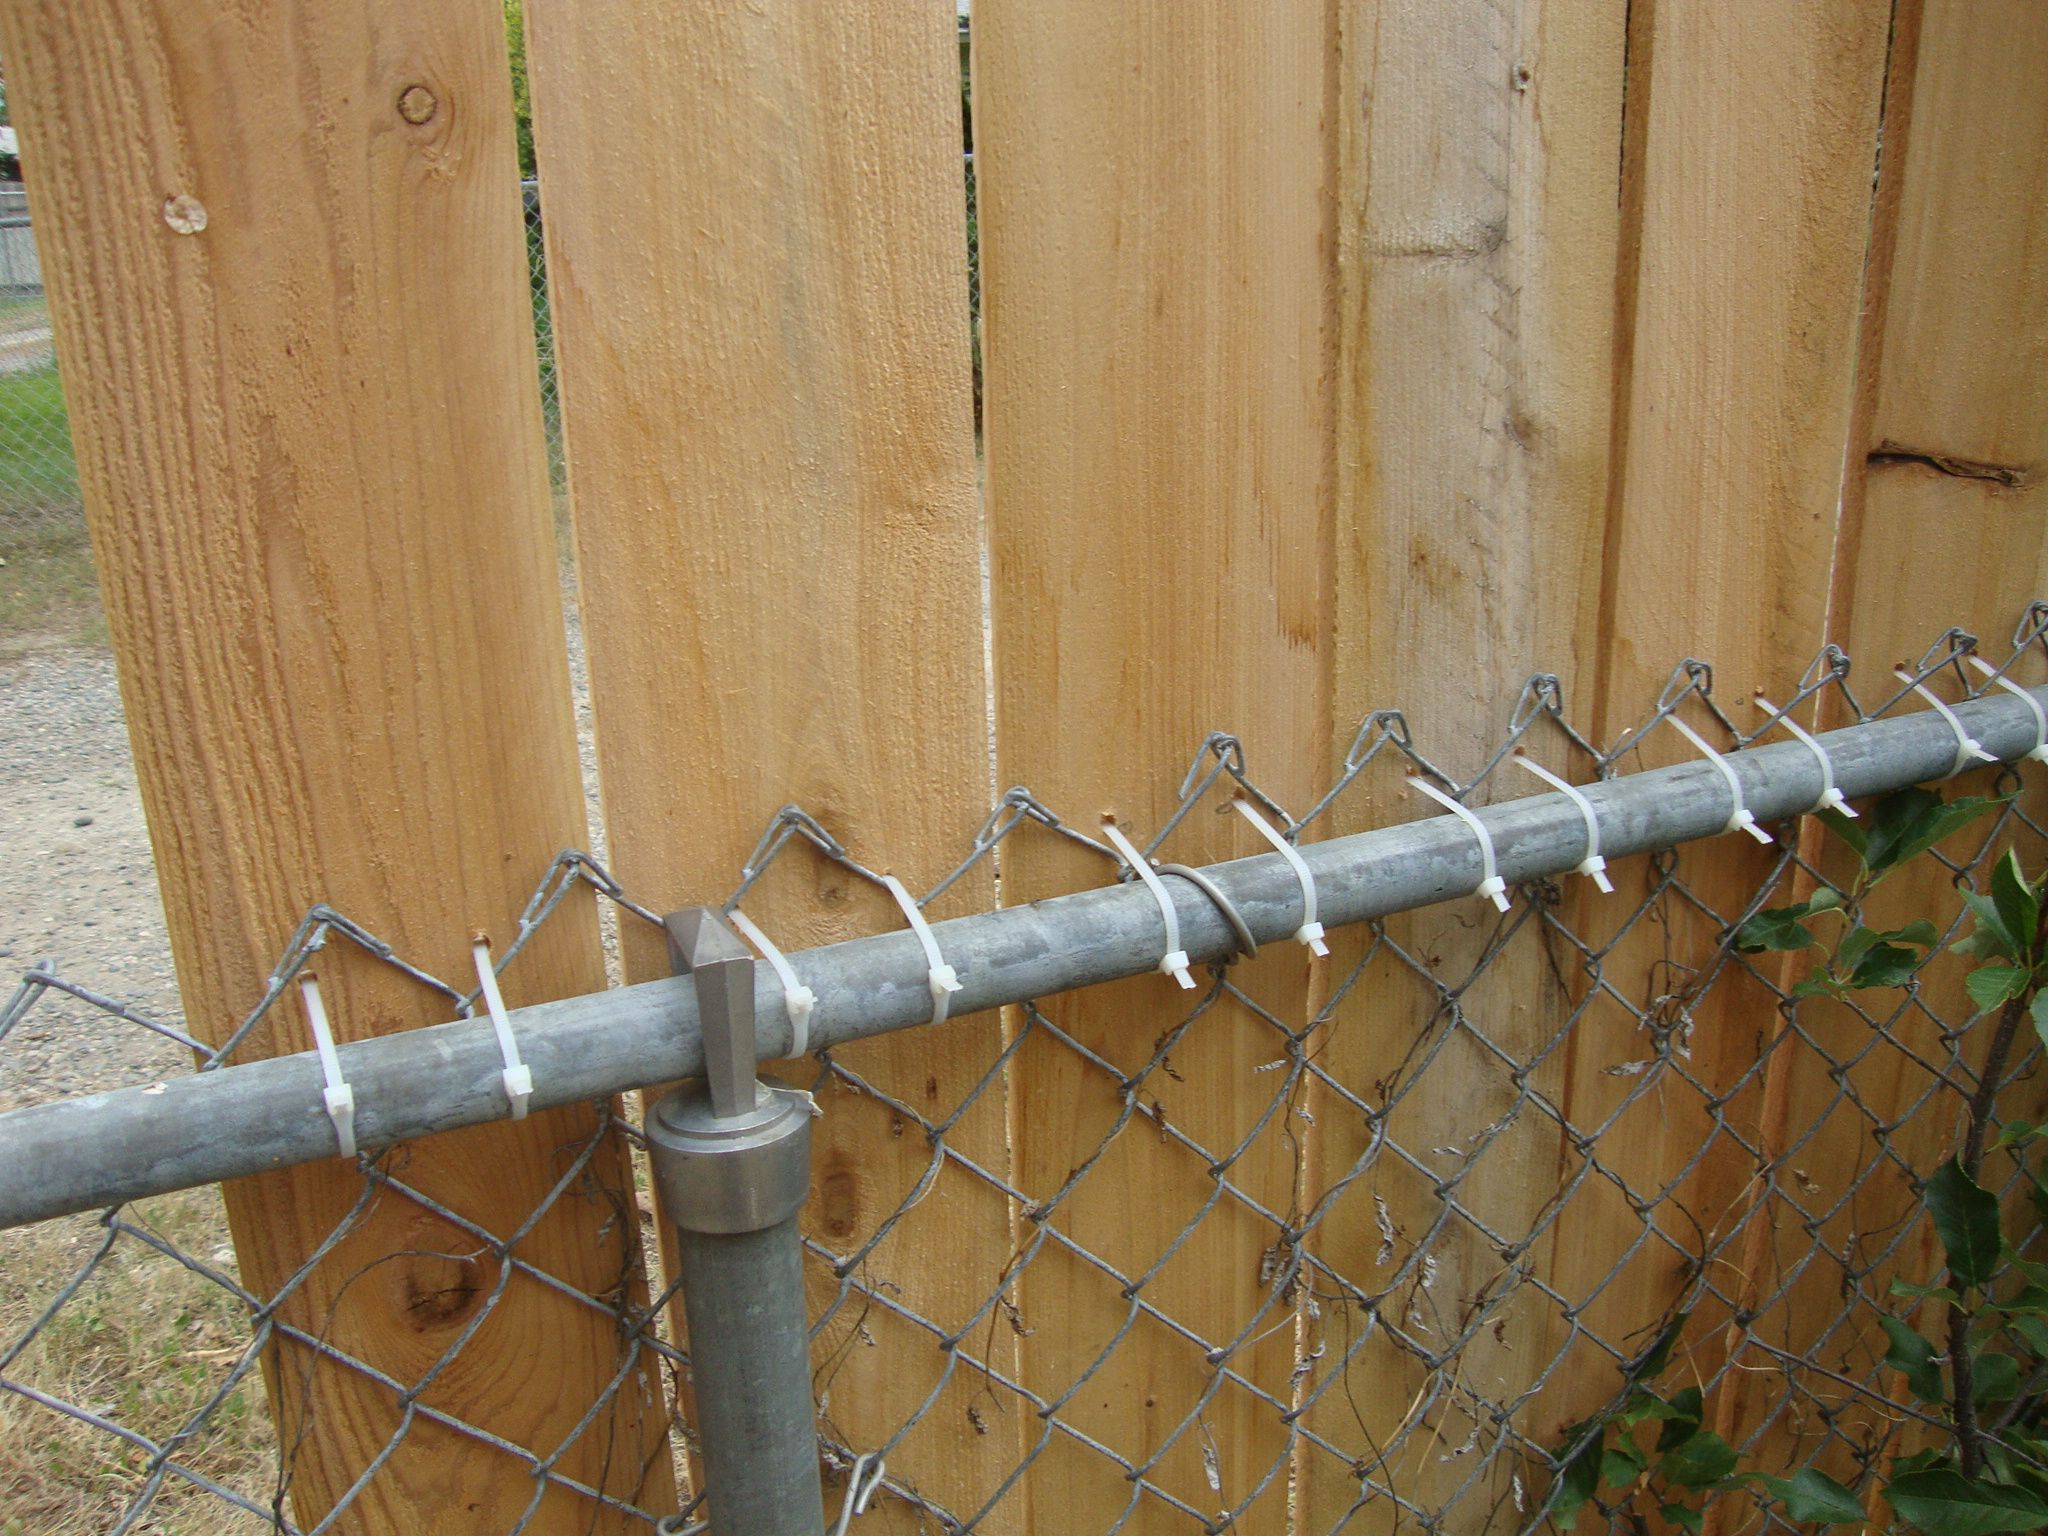 Create A Zip Tie Fence Zip Tie Cedar Planks To A Chain Link Fence